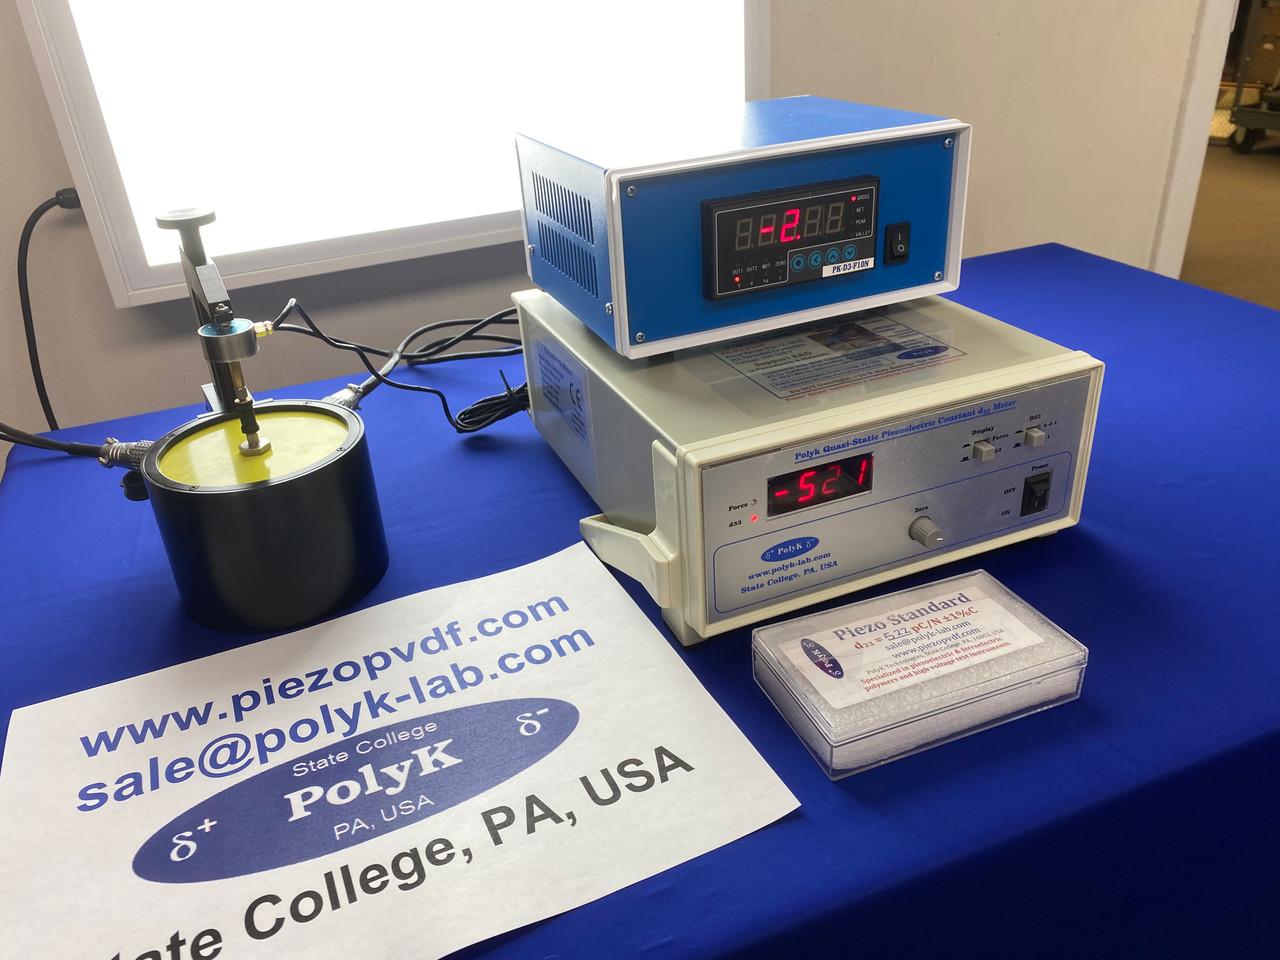 Piezoelectric meter (2000 pF/N) to measure d33 piezoelectric constant, with static force sensor